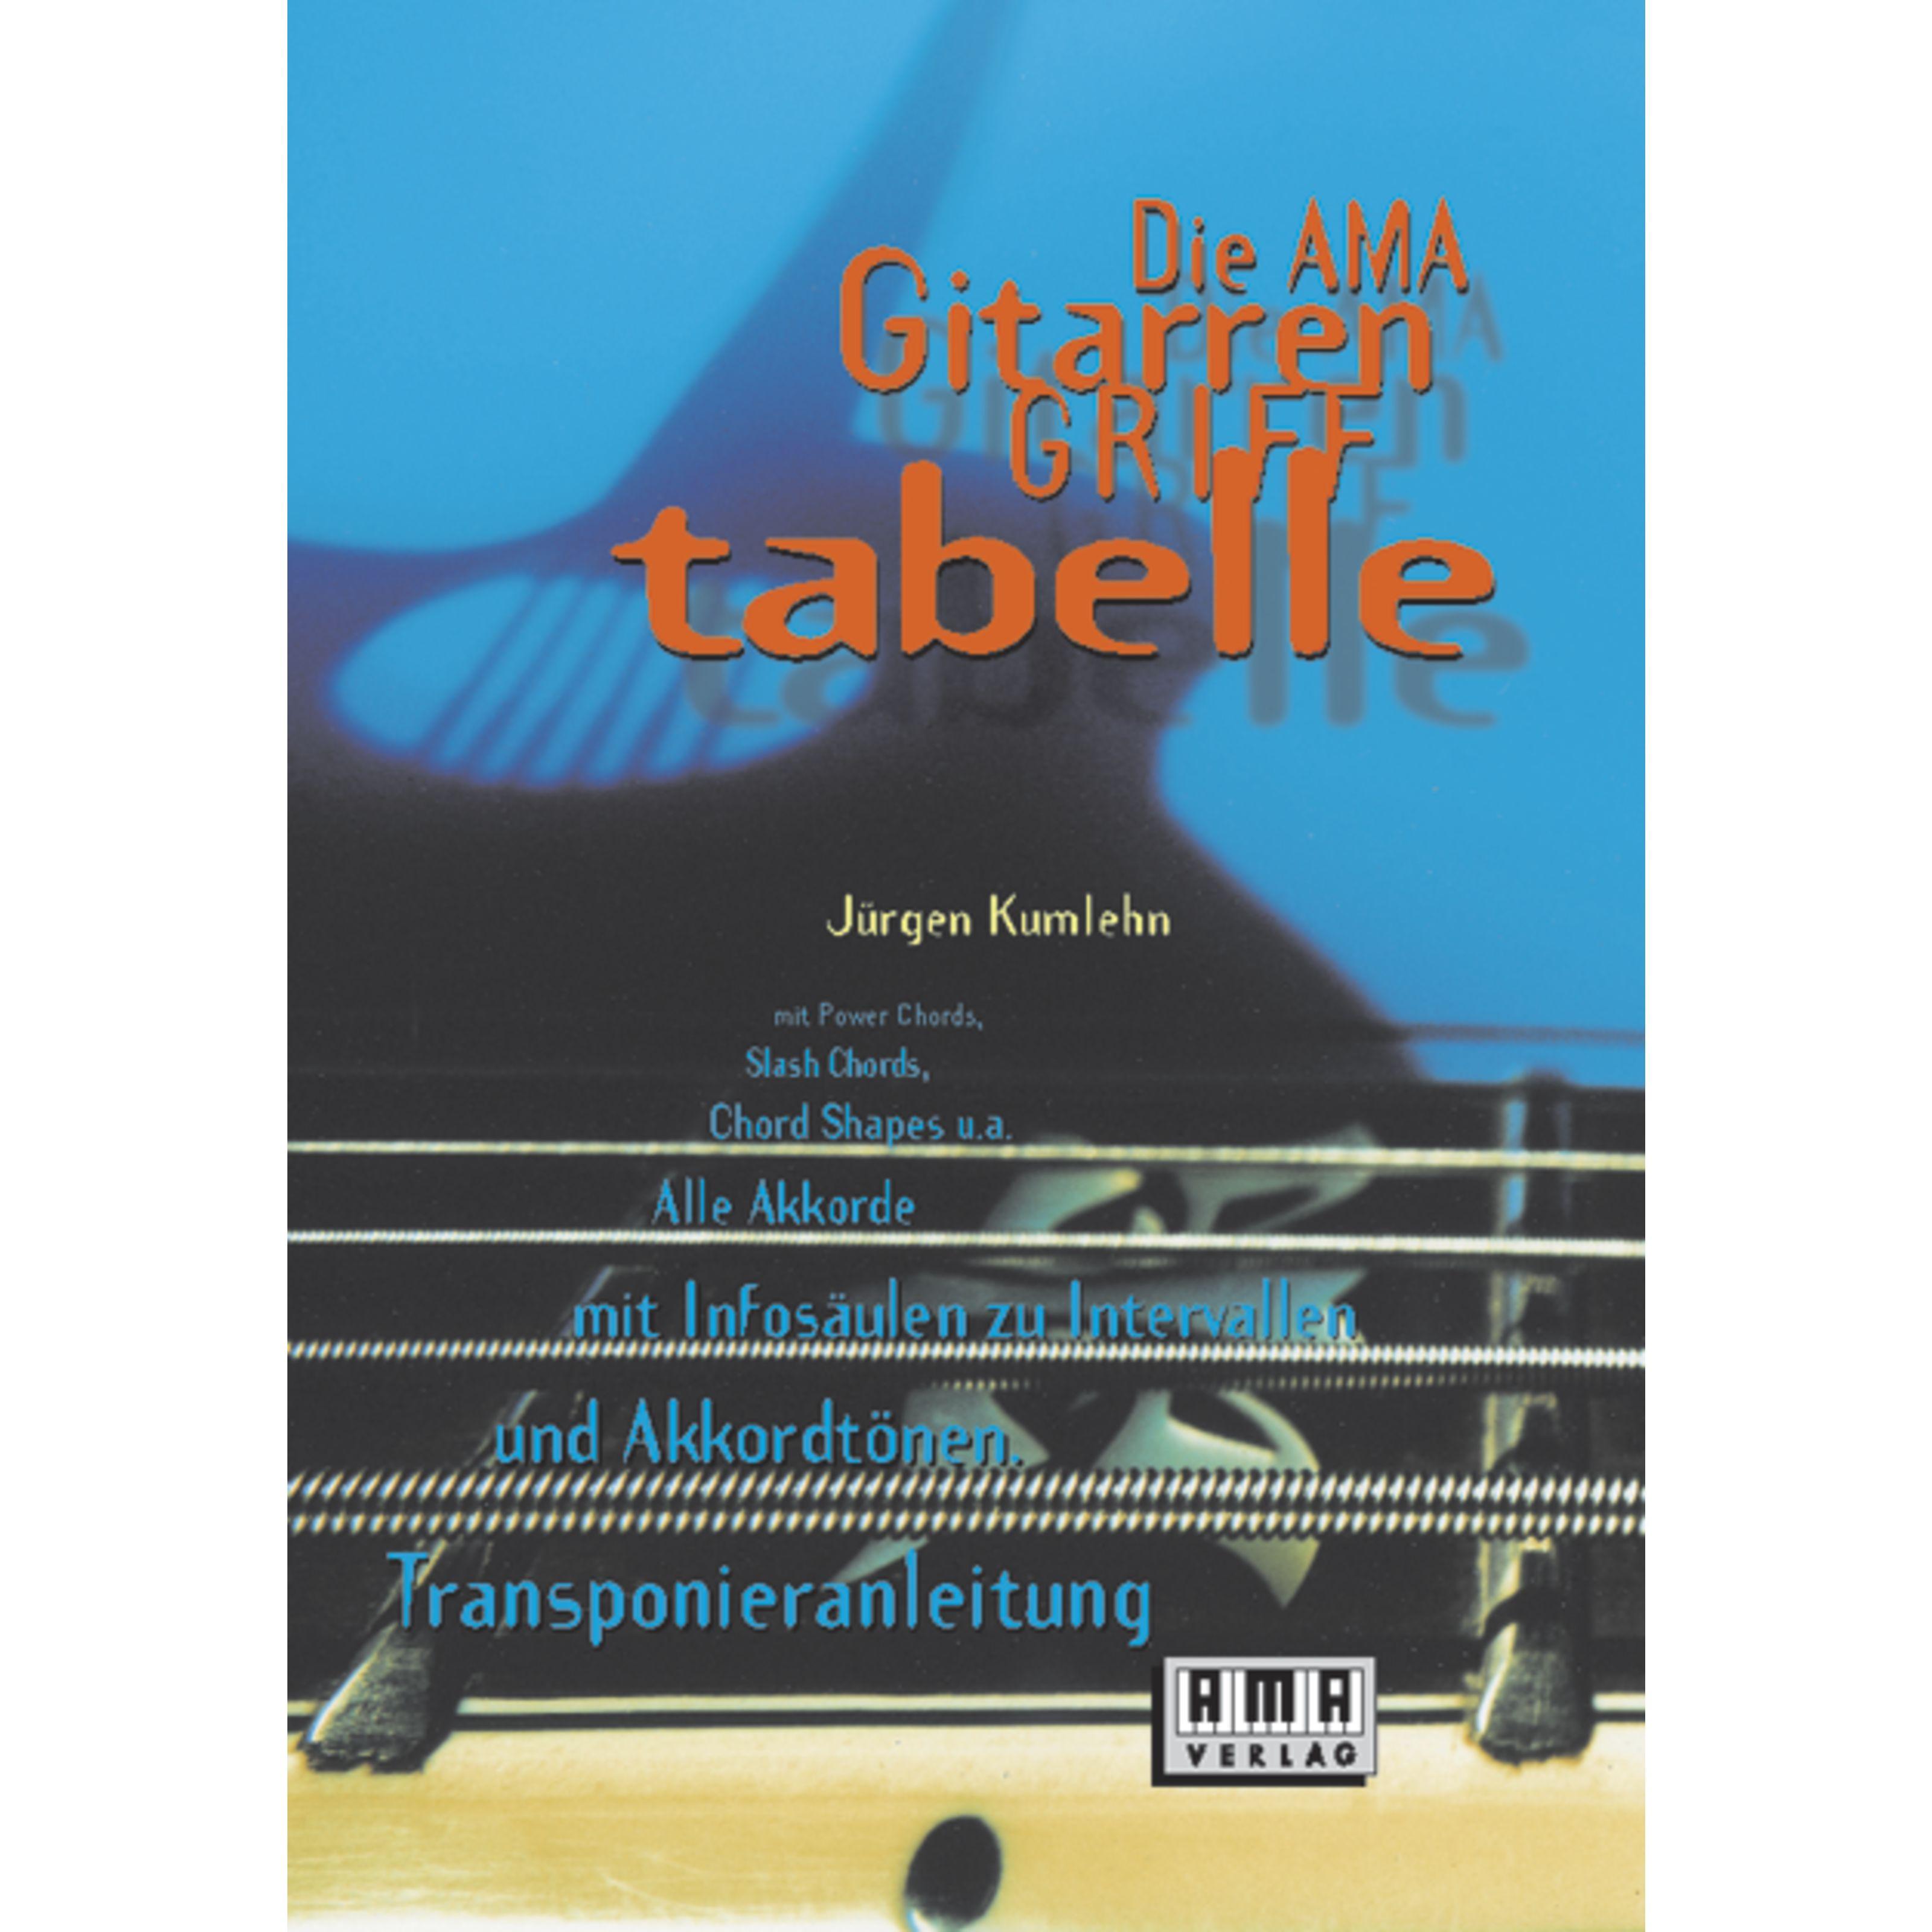 AMA Verlag - Die Ama-Gitarren-Grifftabelle 610109